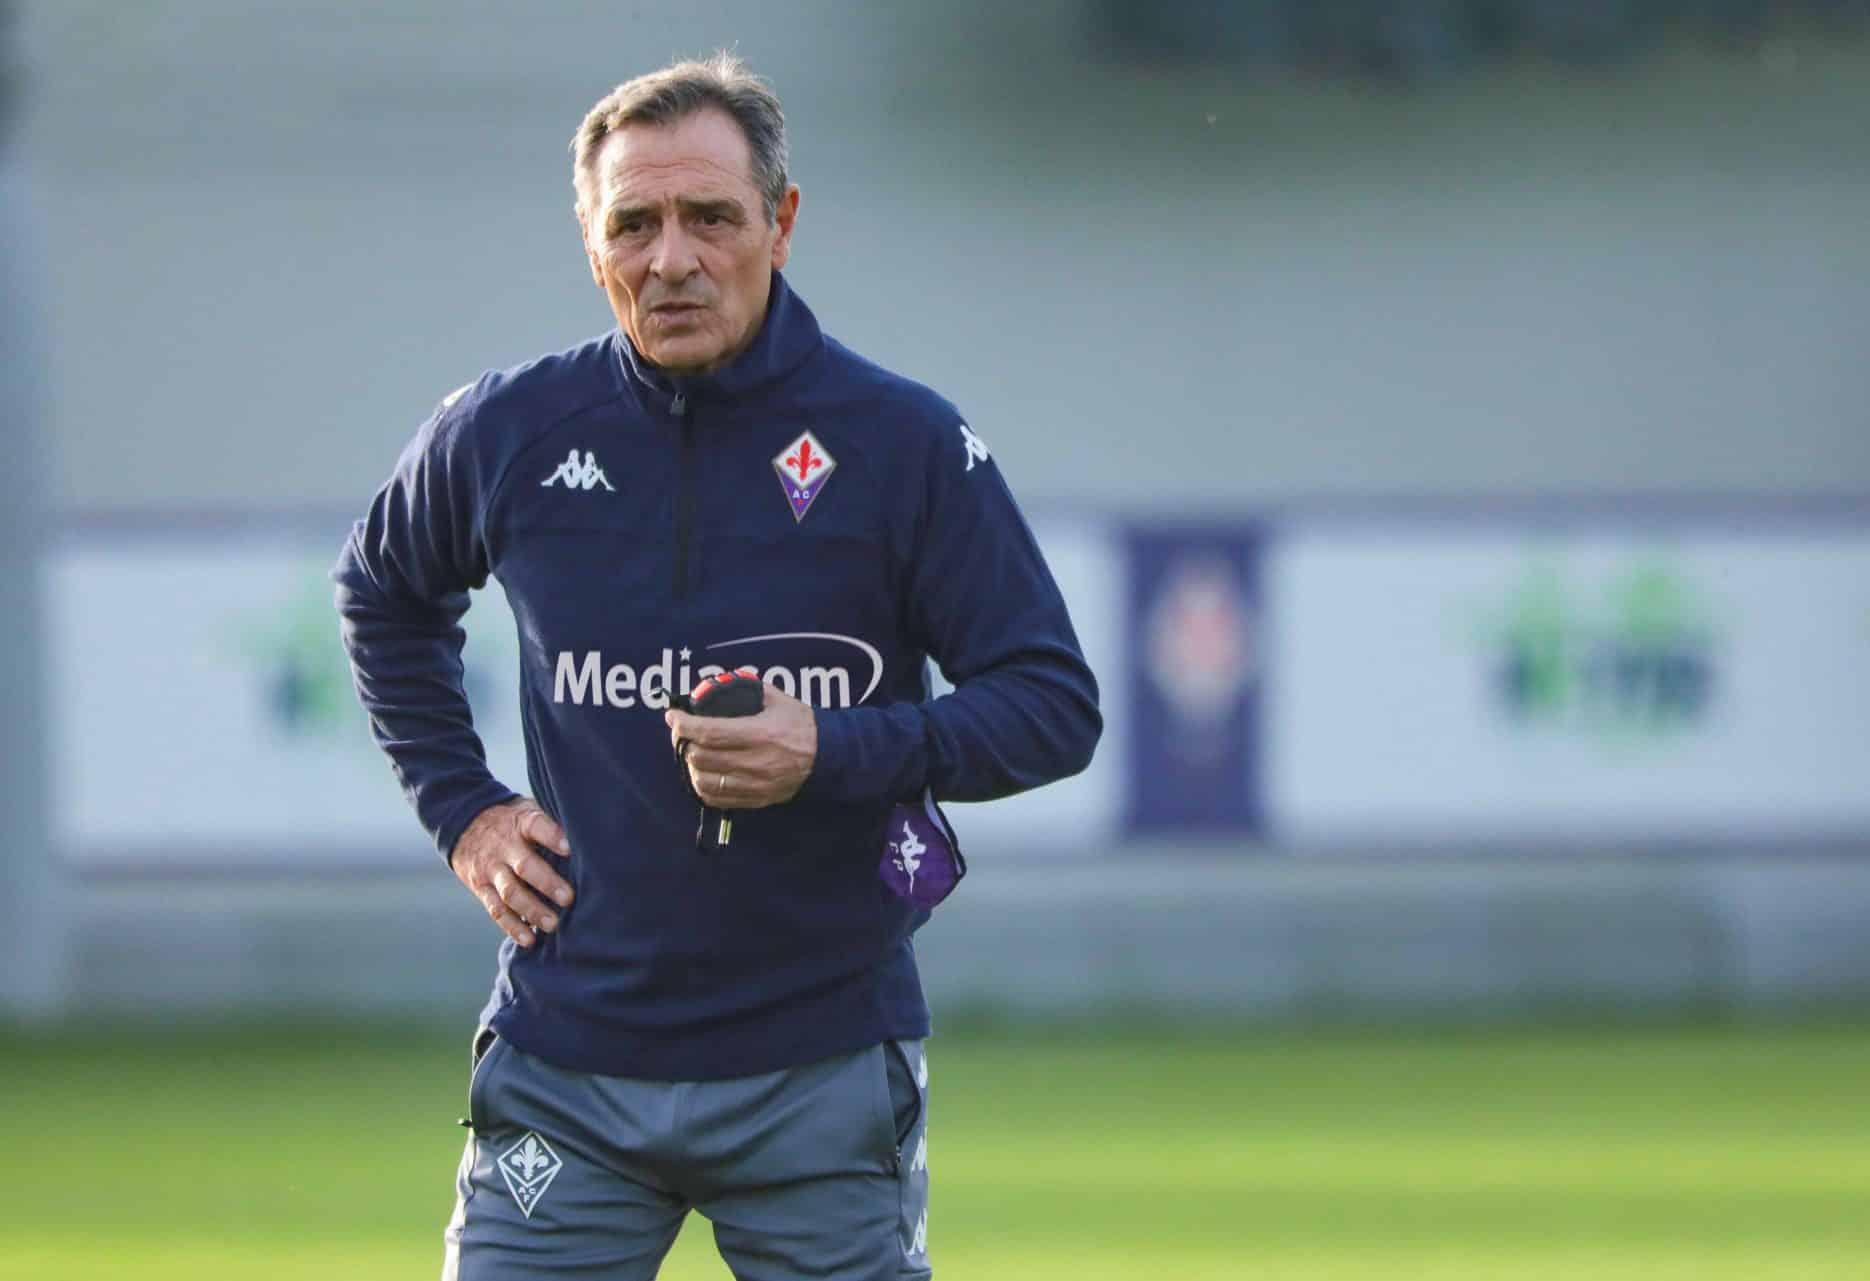 Fiorentina – Benevento: esordio per Prandelli